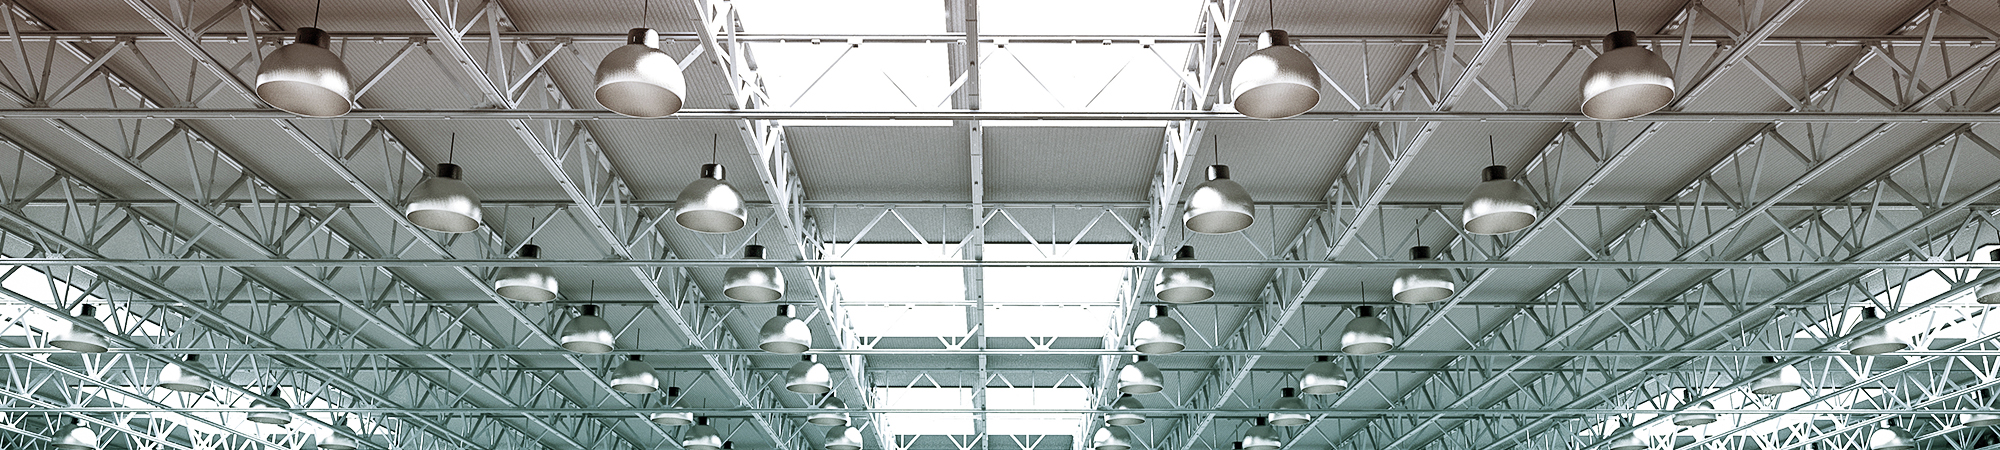 Industriehallen Beleuchtung